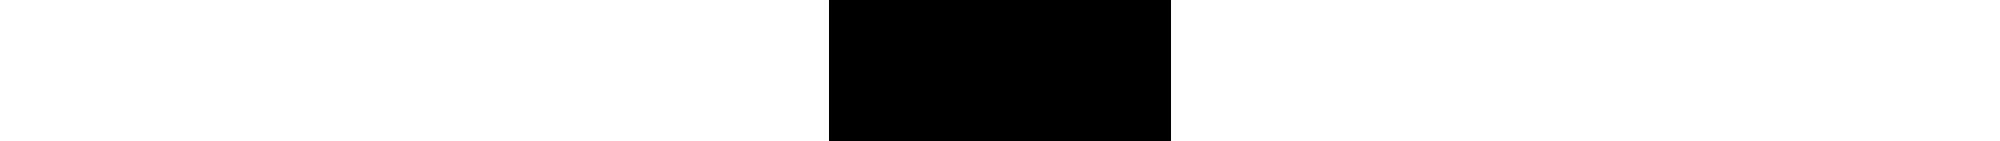 retronaut-logos-oja-banner-bl.png